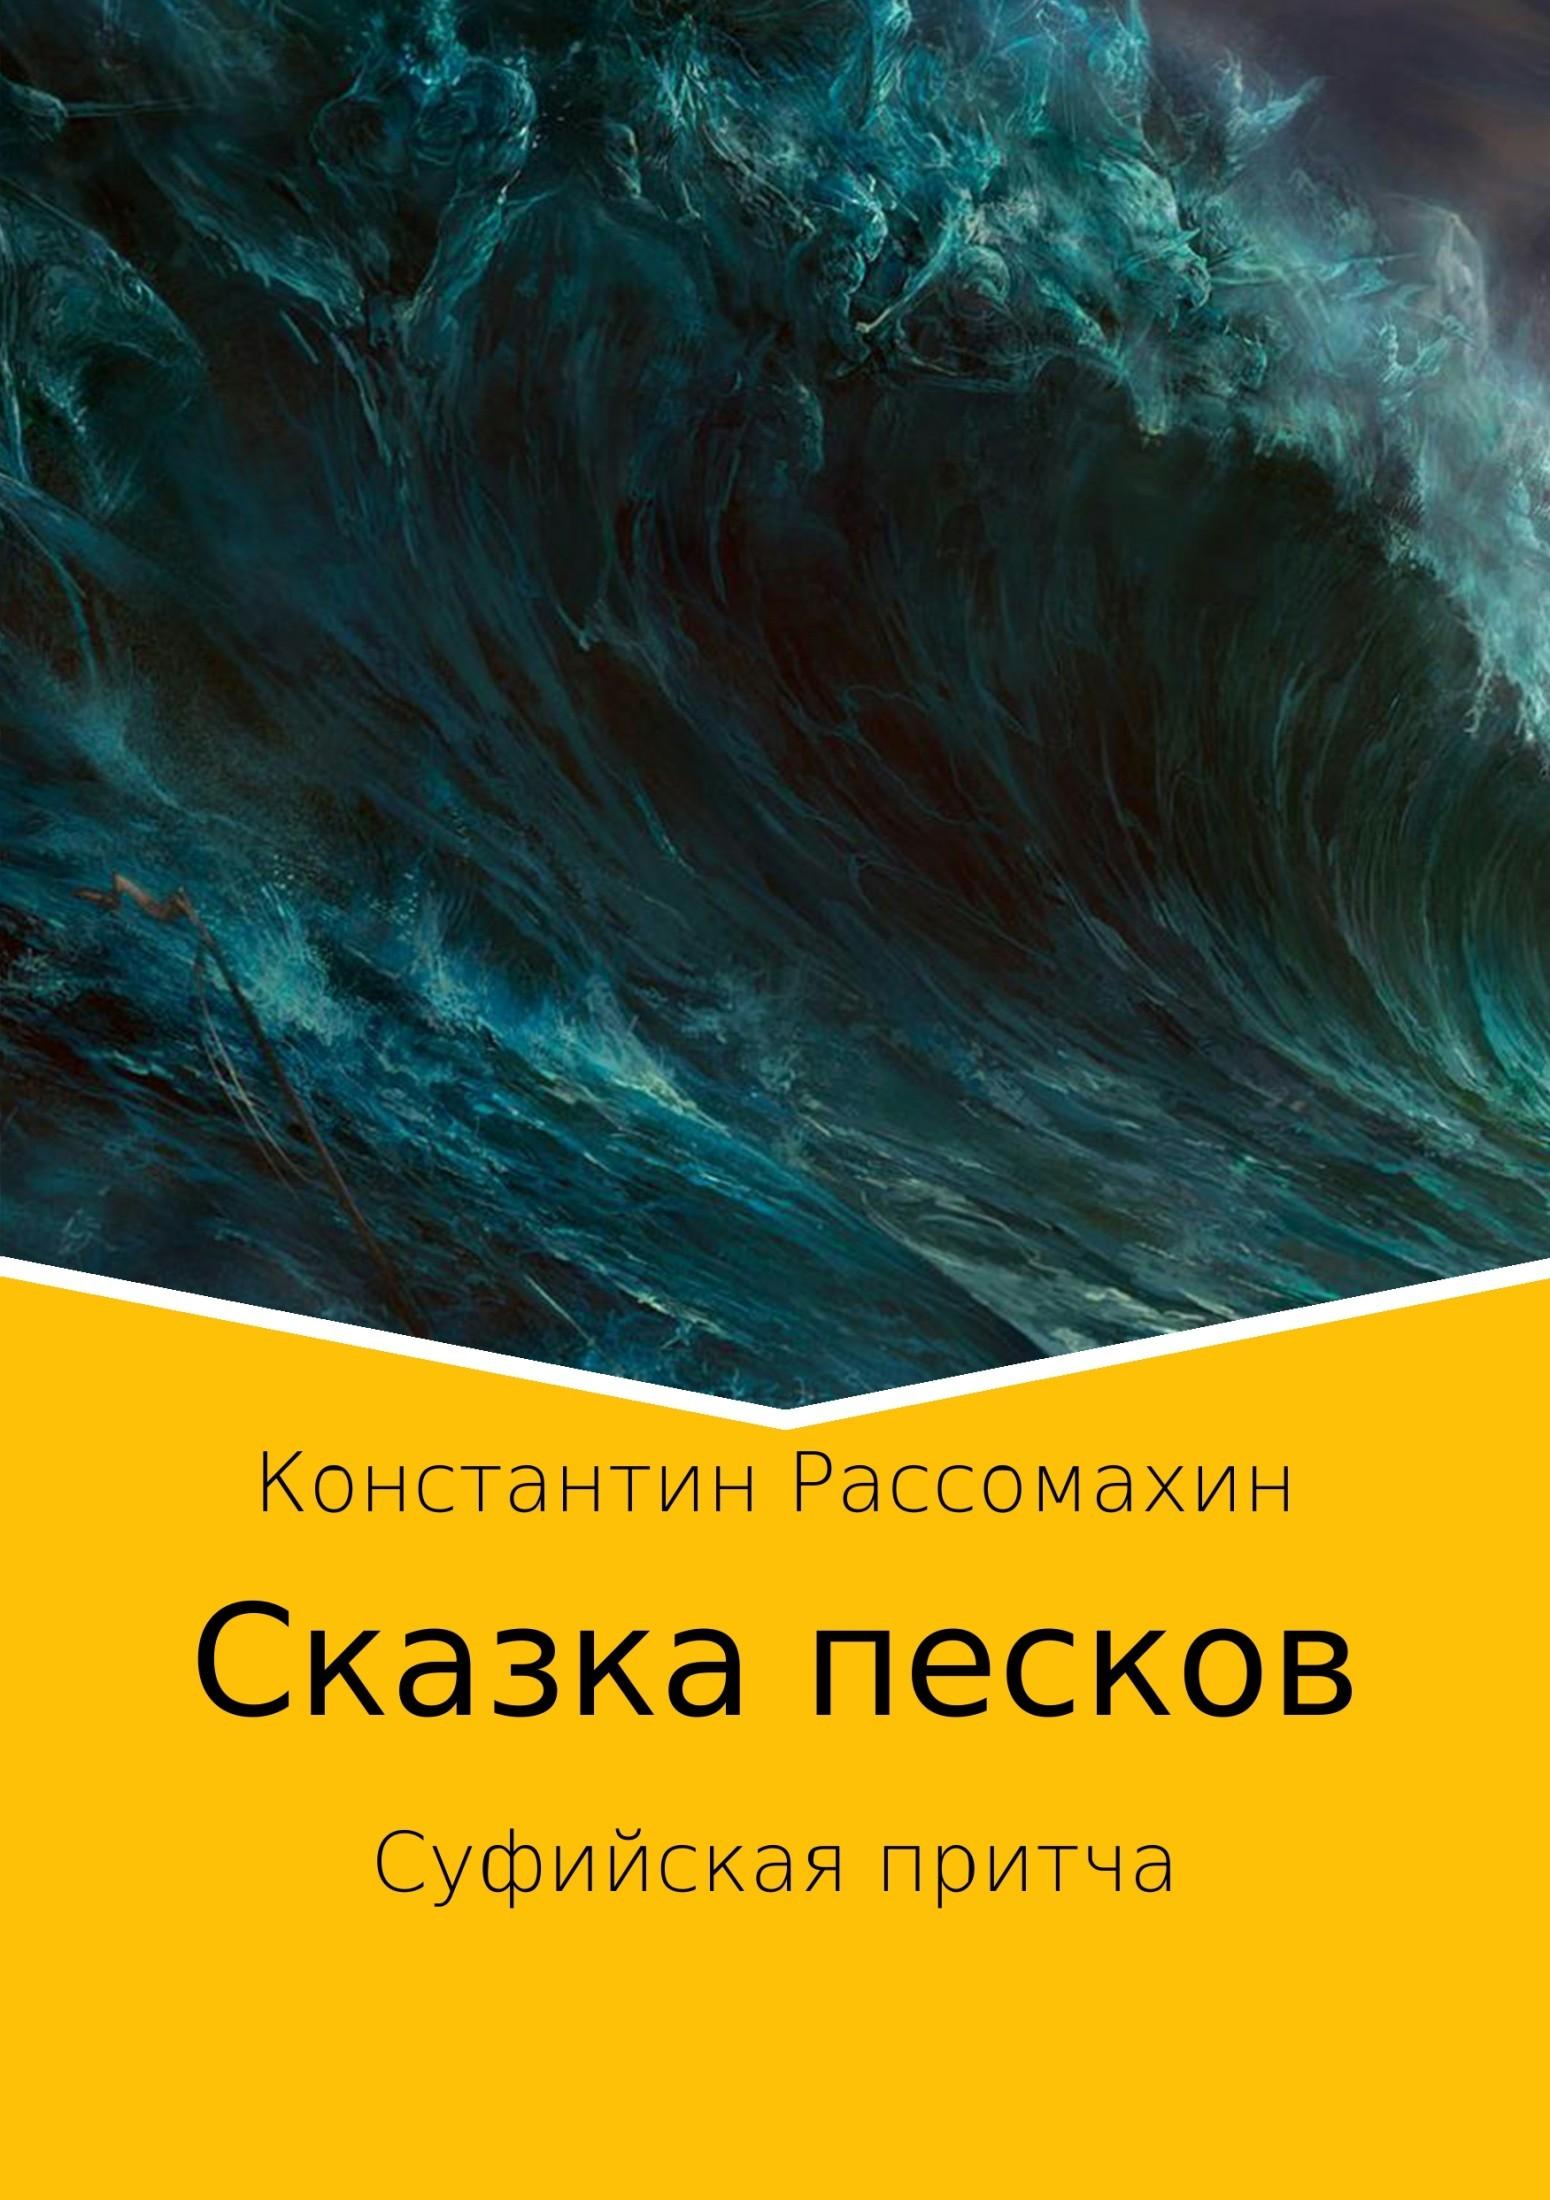 Константин Александрович Рассомахин Сказка песков. Суфийская притча